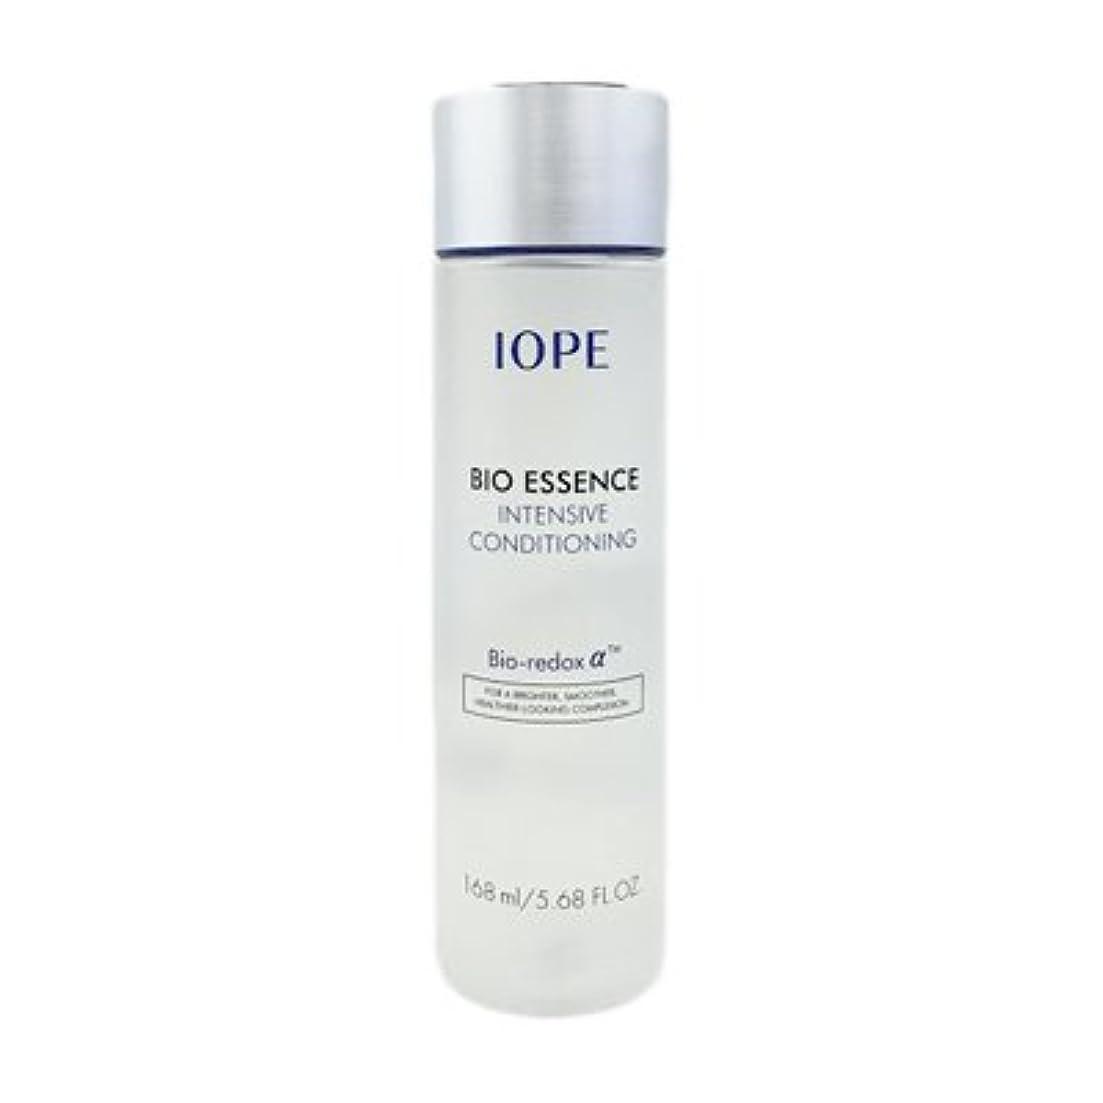 IOPE/アイオペ バイオエッセンス インテンシブ コンディショニング 168ml [並行輸入品]